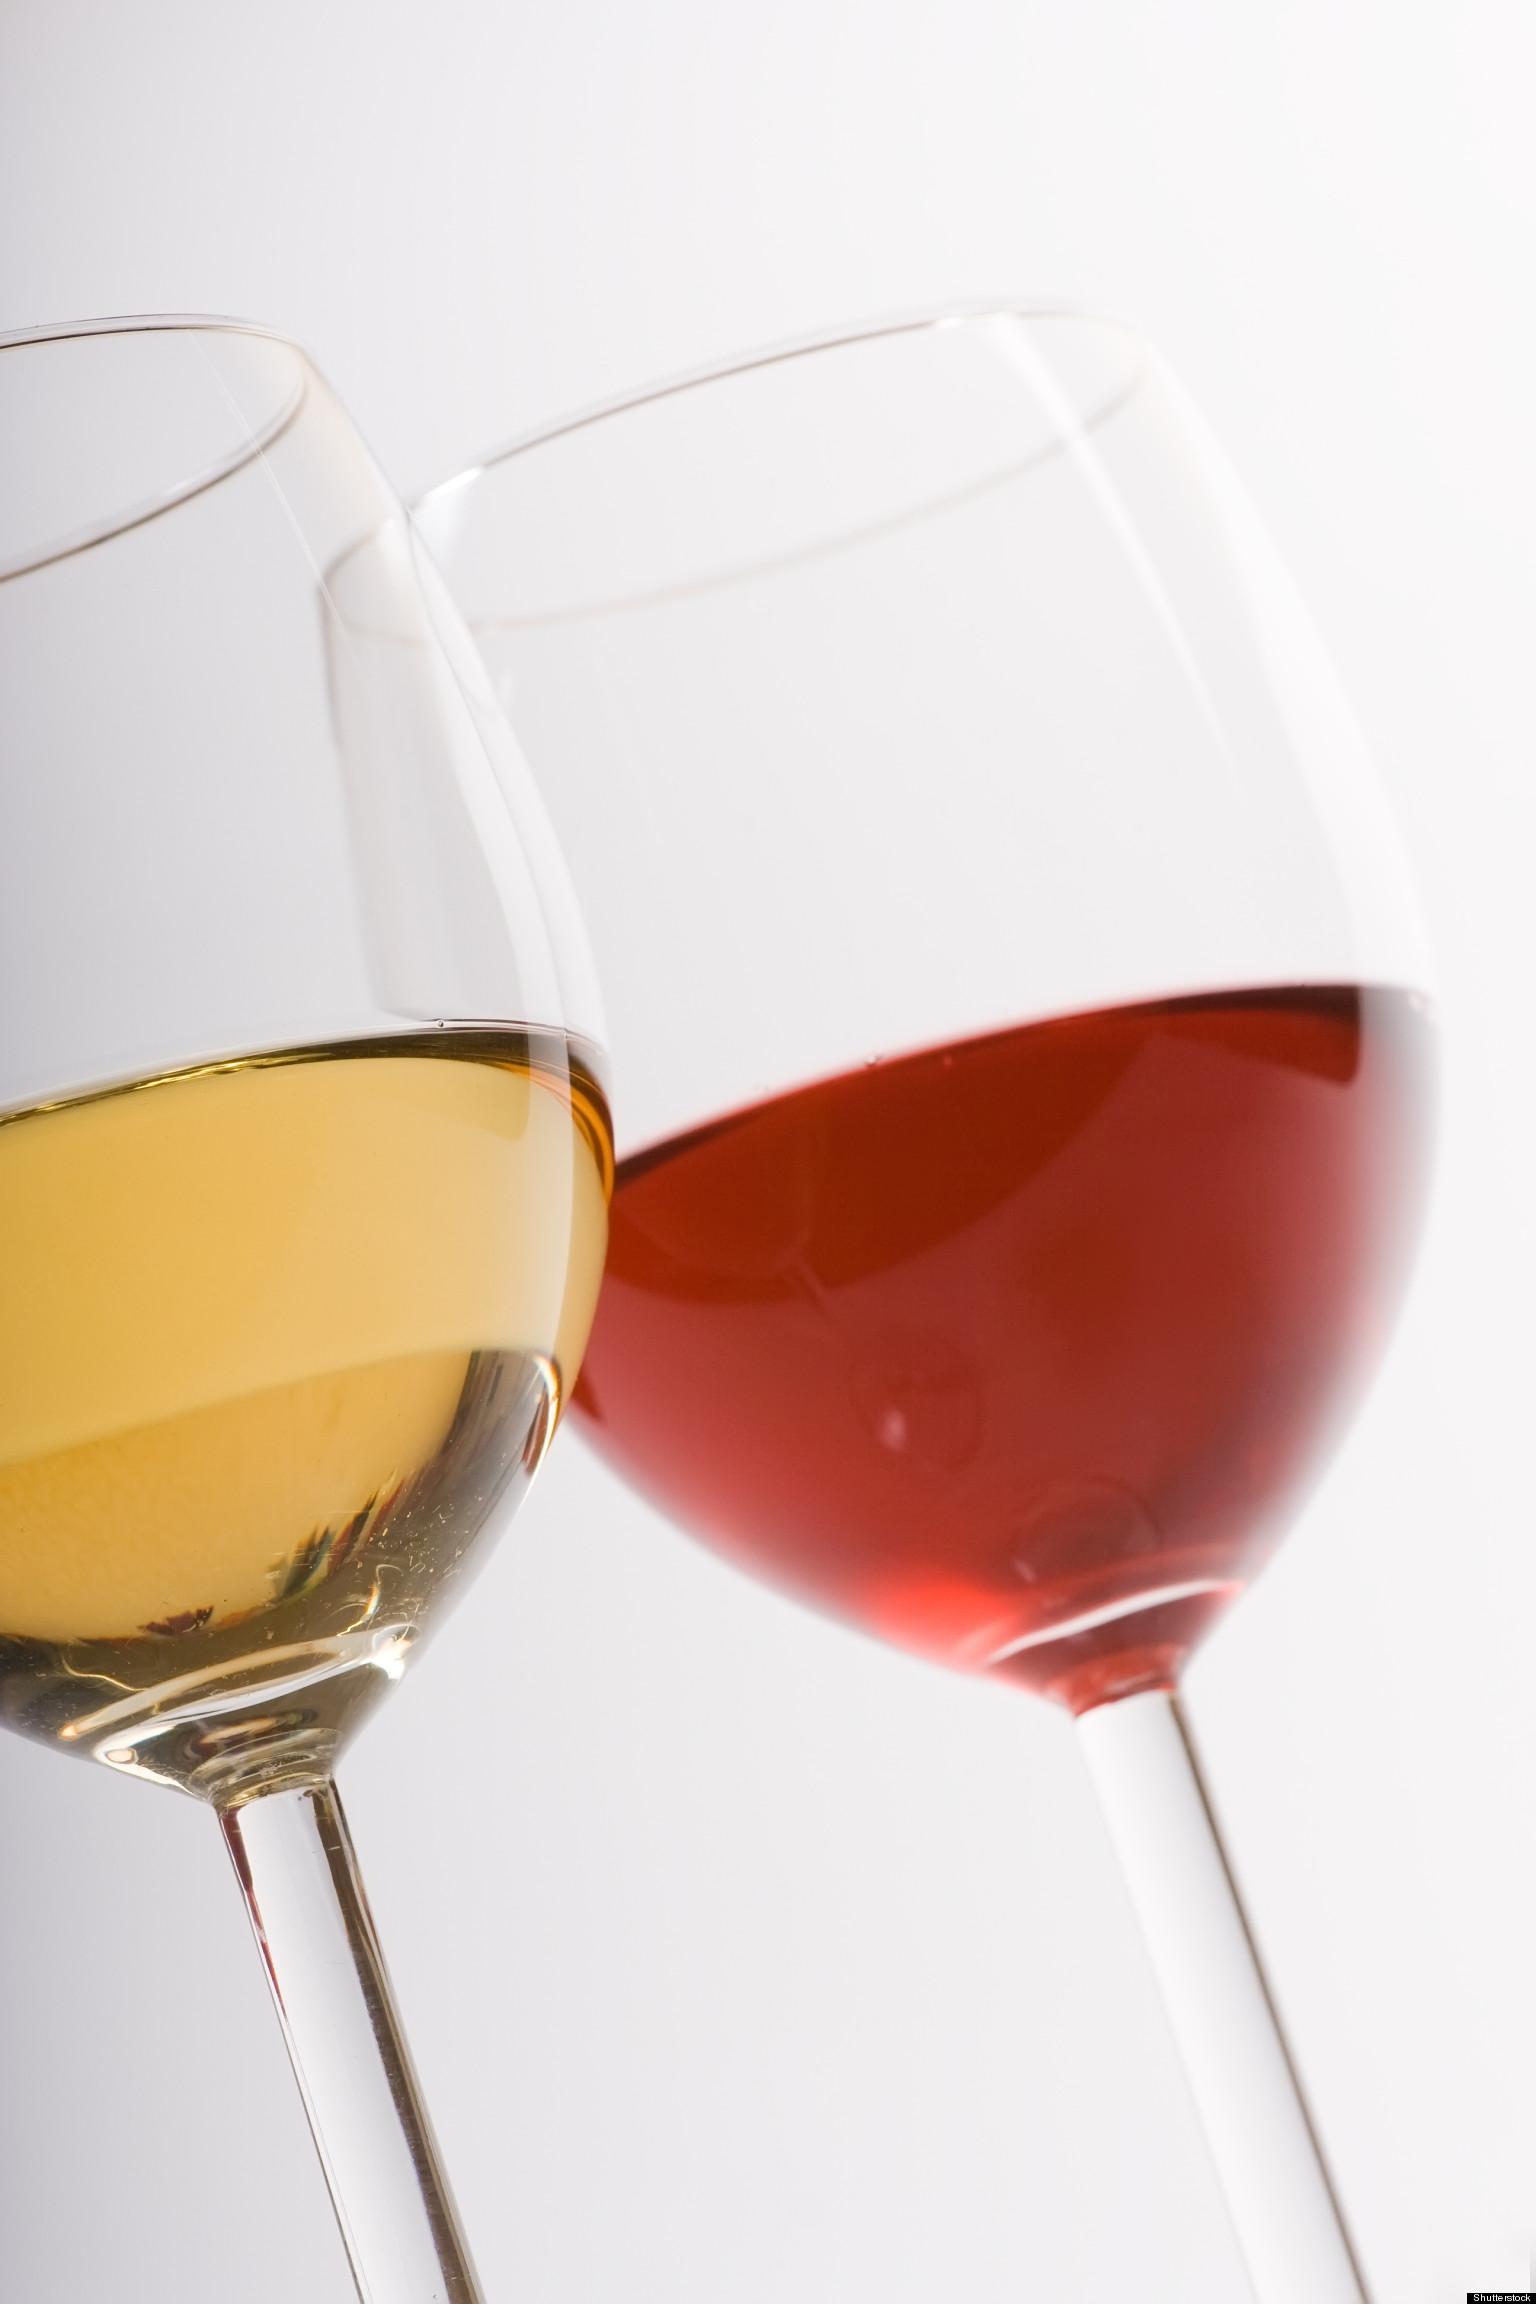 Alcohol in Australia